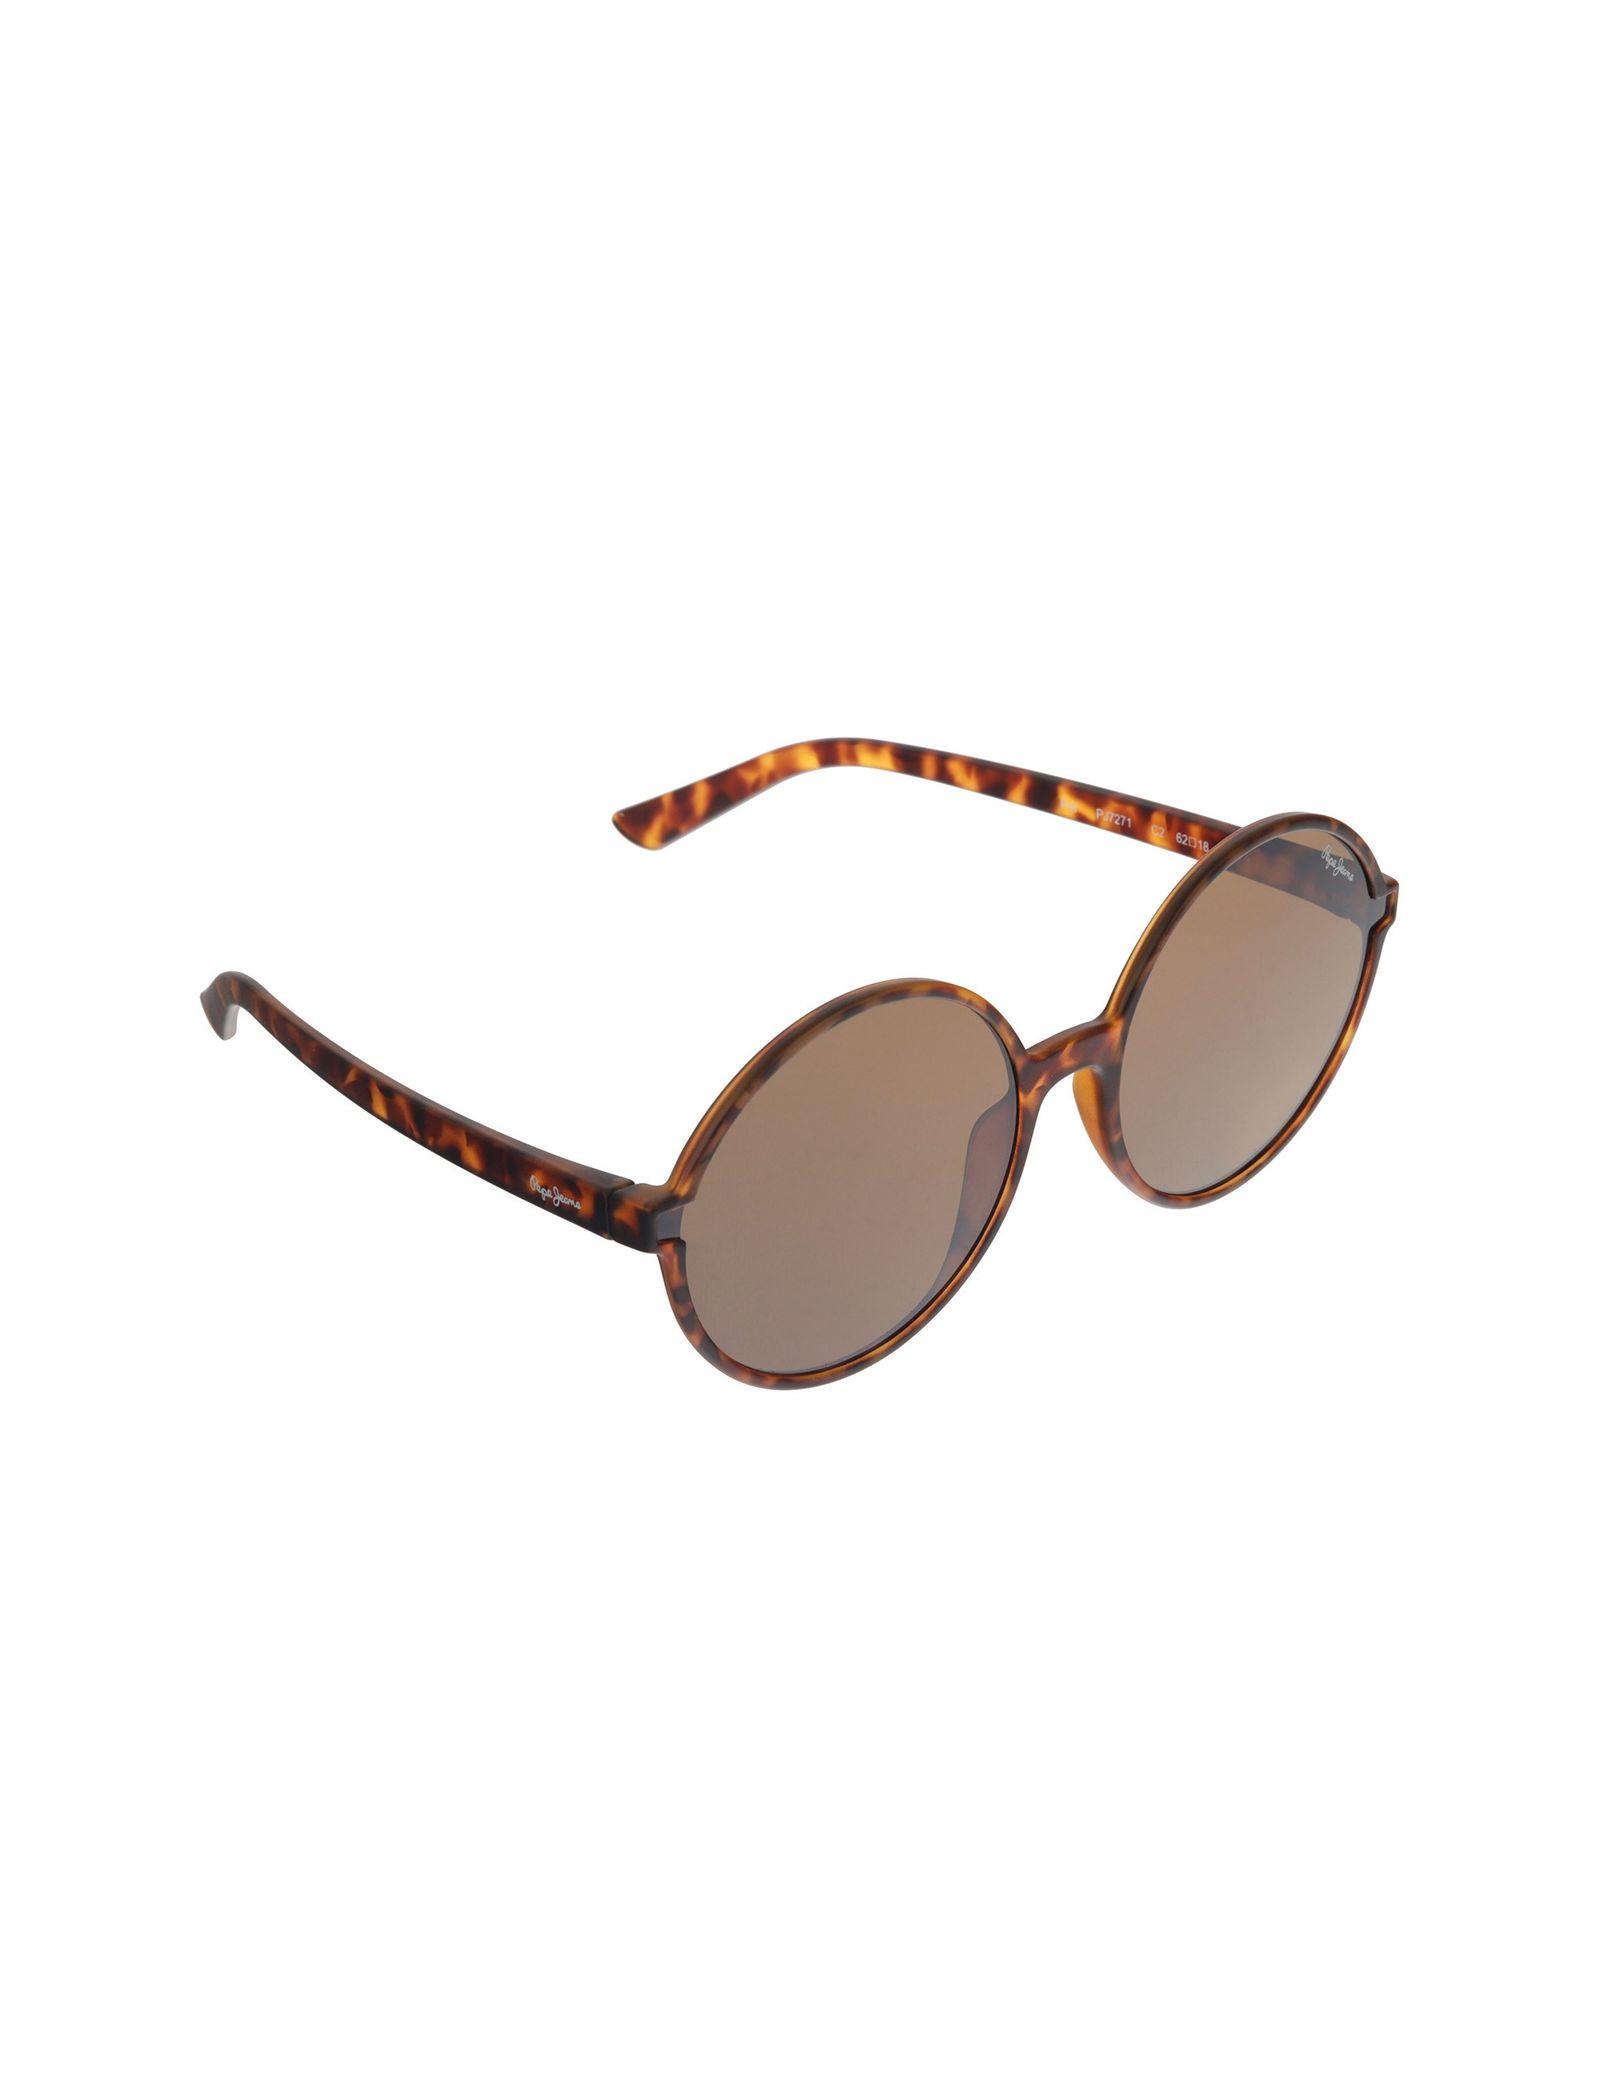 عینک آفتابی گرد زنانه - پپه جینز - قهوه اي  - 2